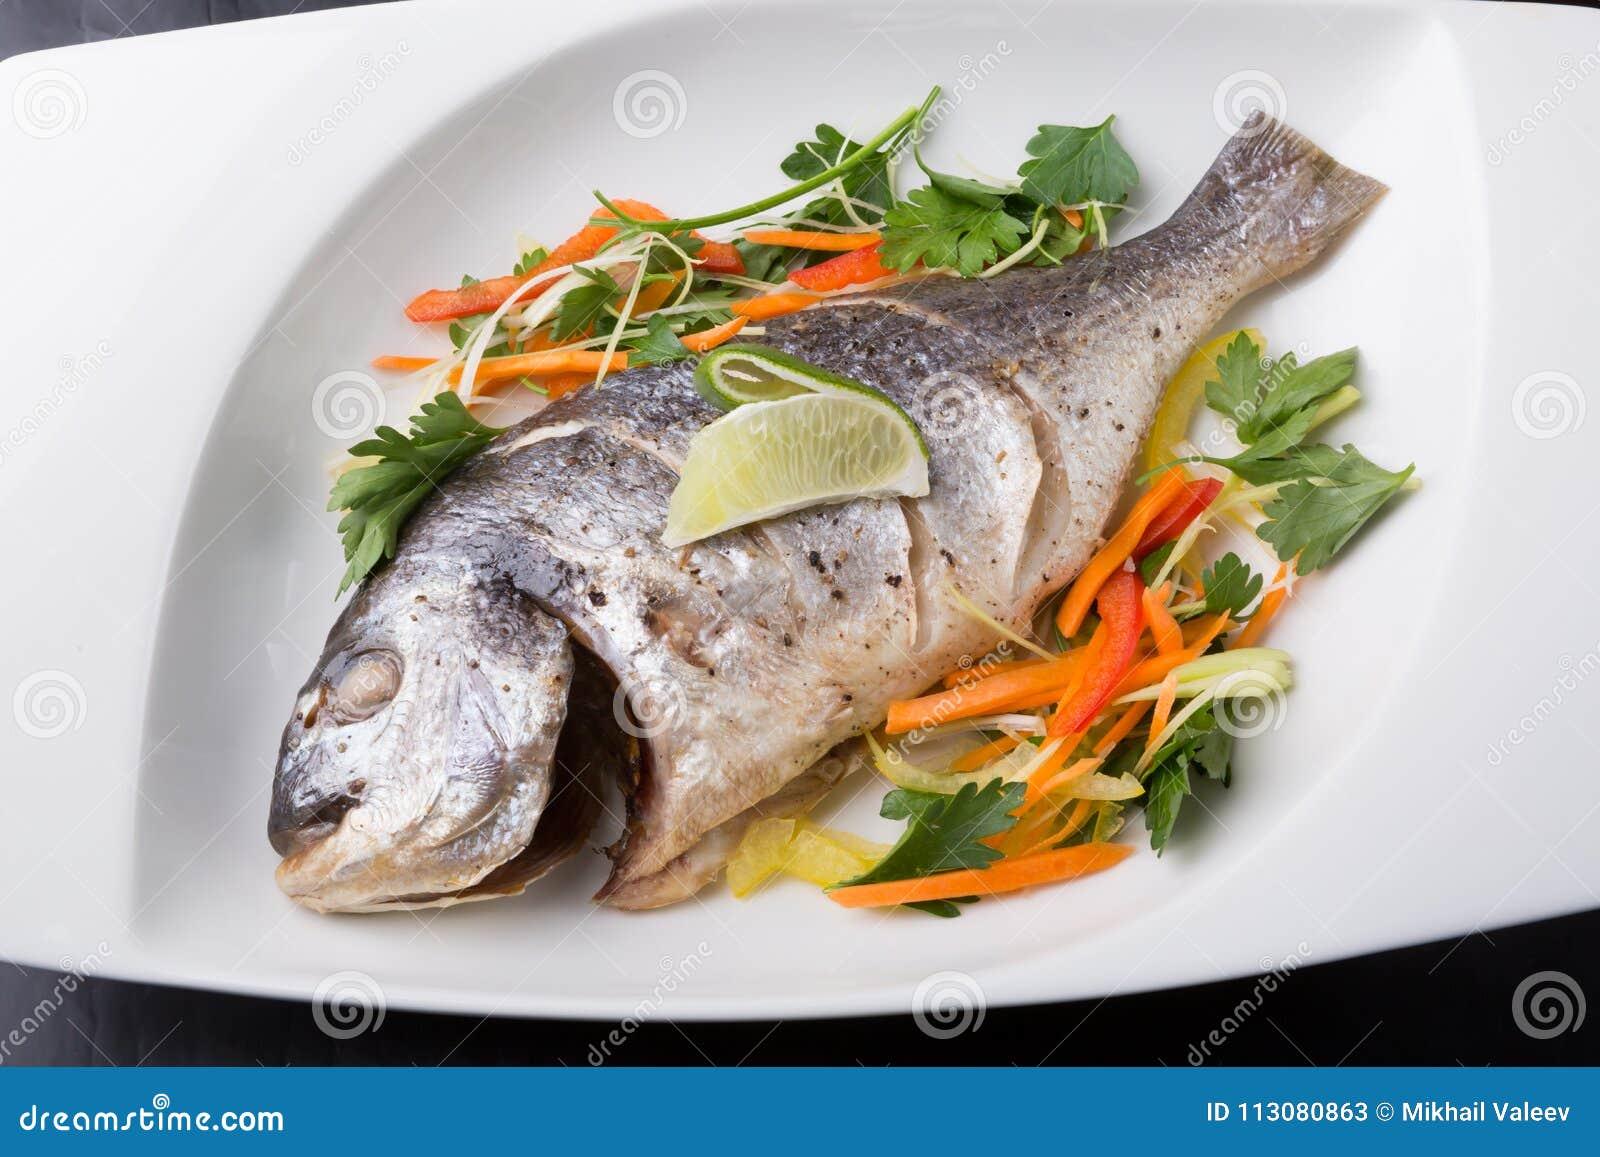 Whole steamed dorado fish